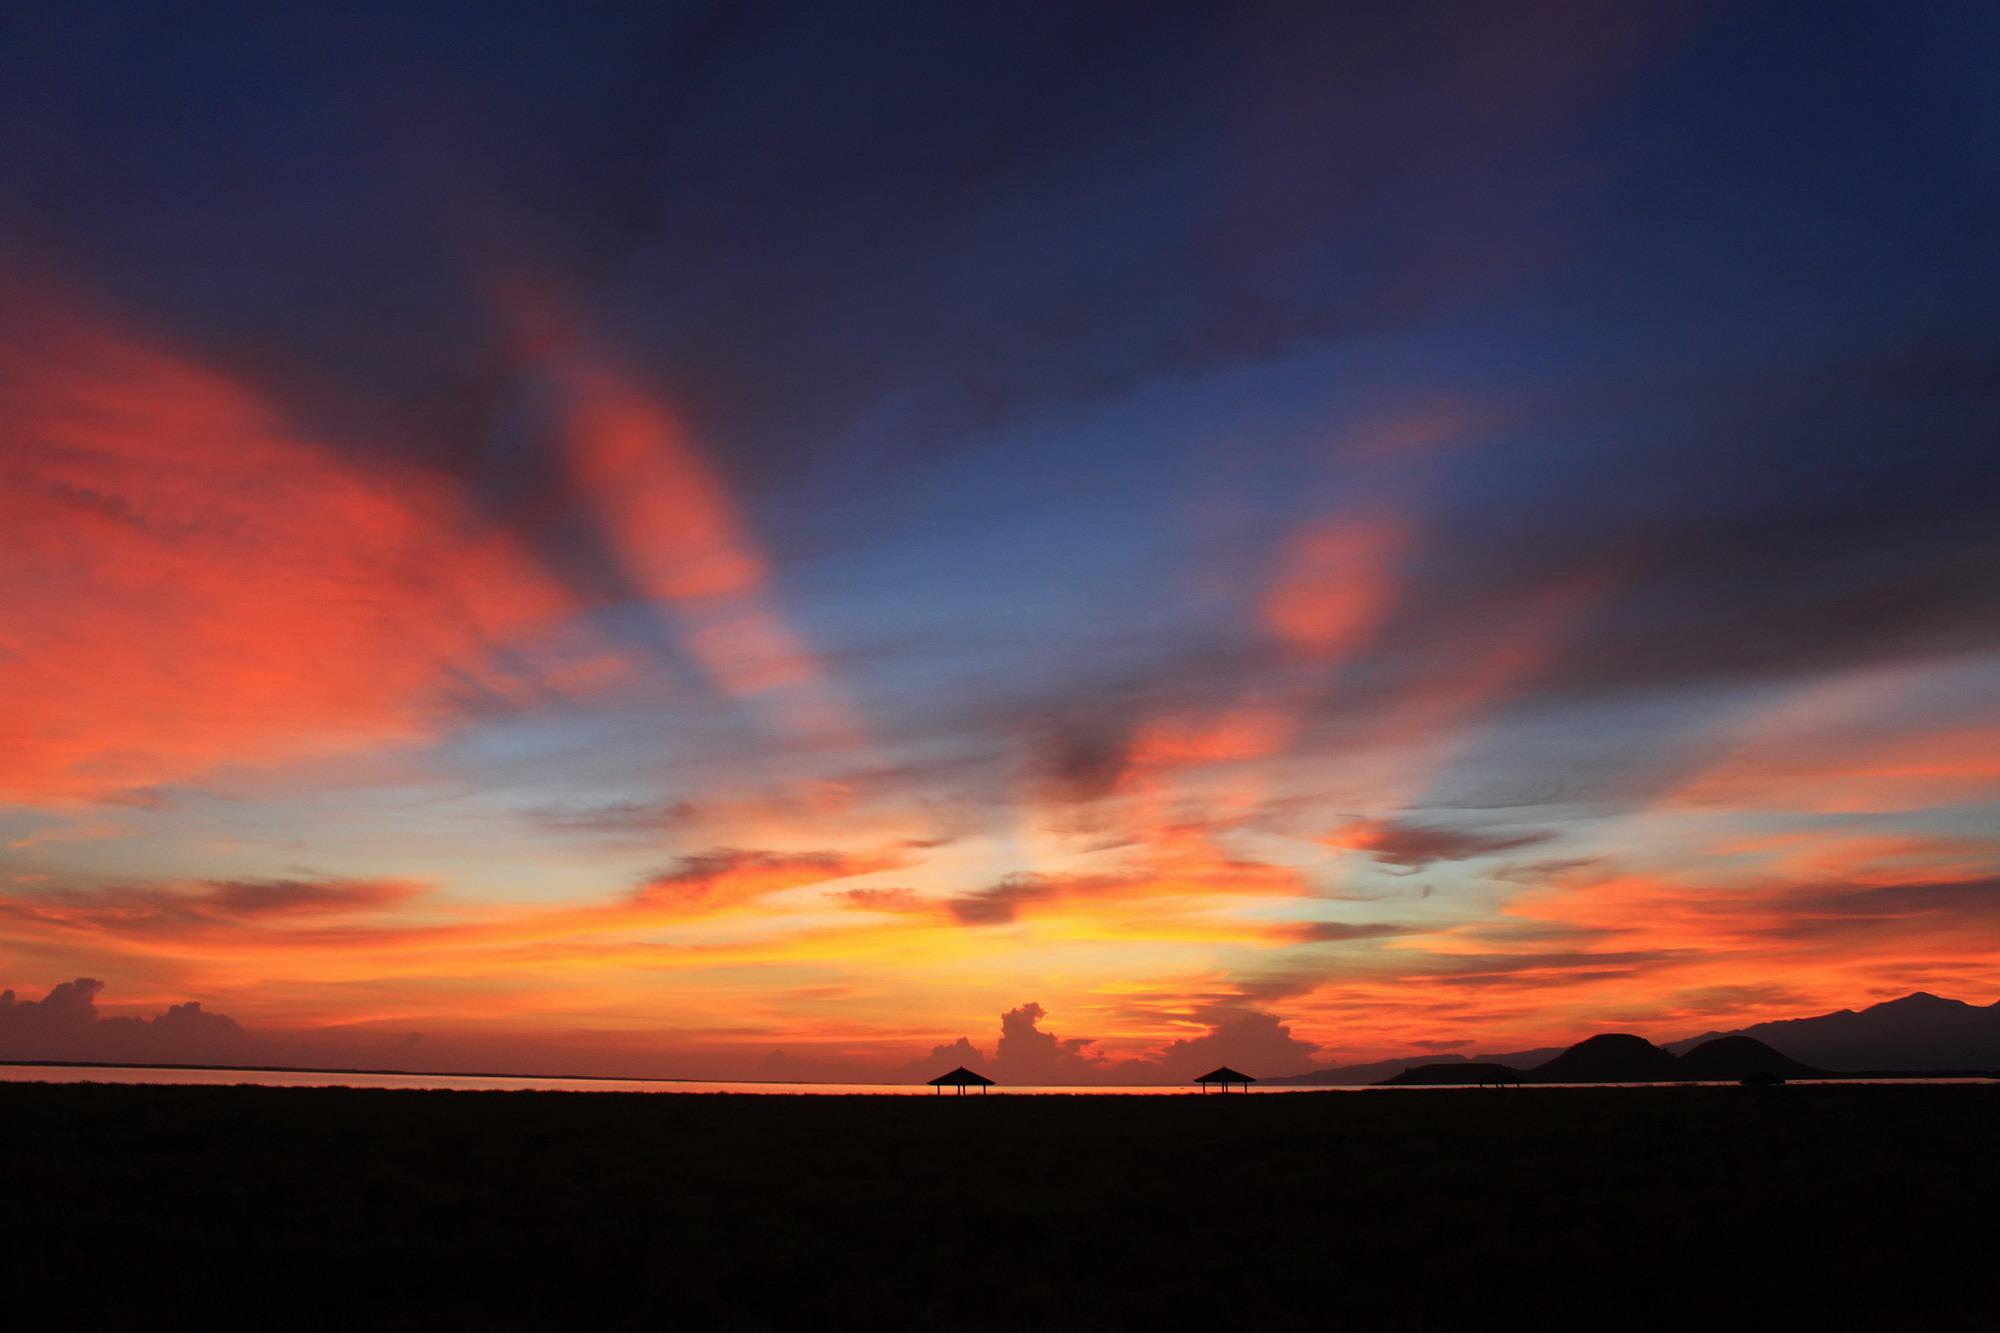 Sunrise Cantik di Pulau Kenawa